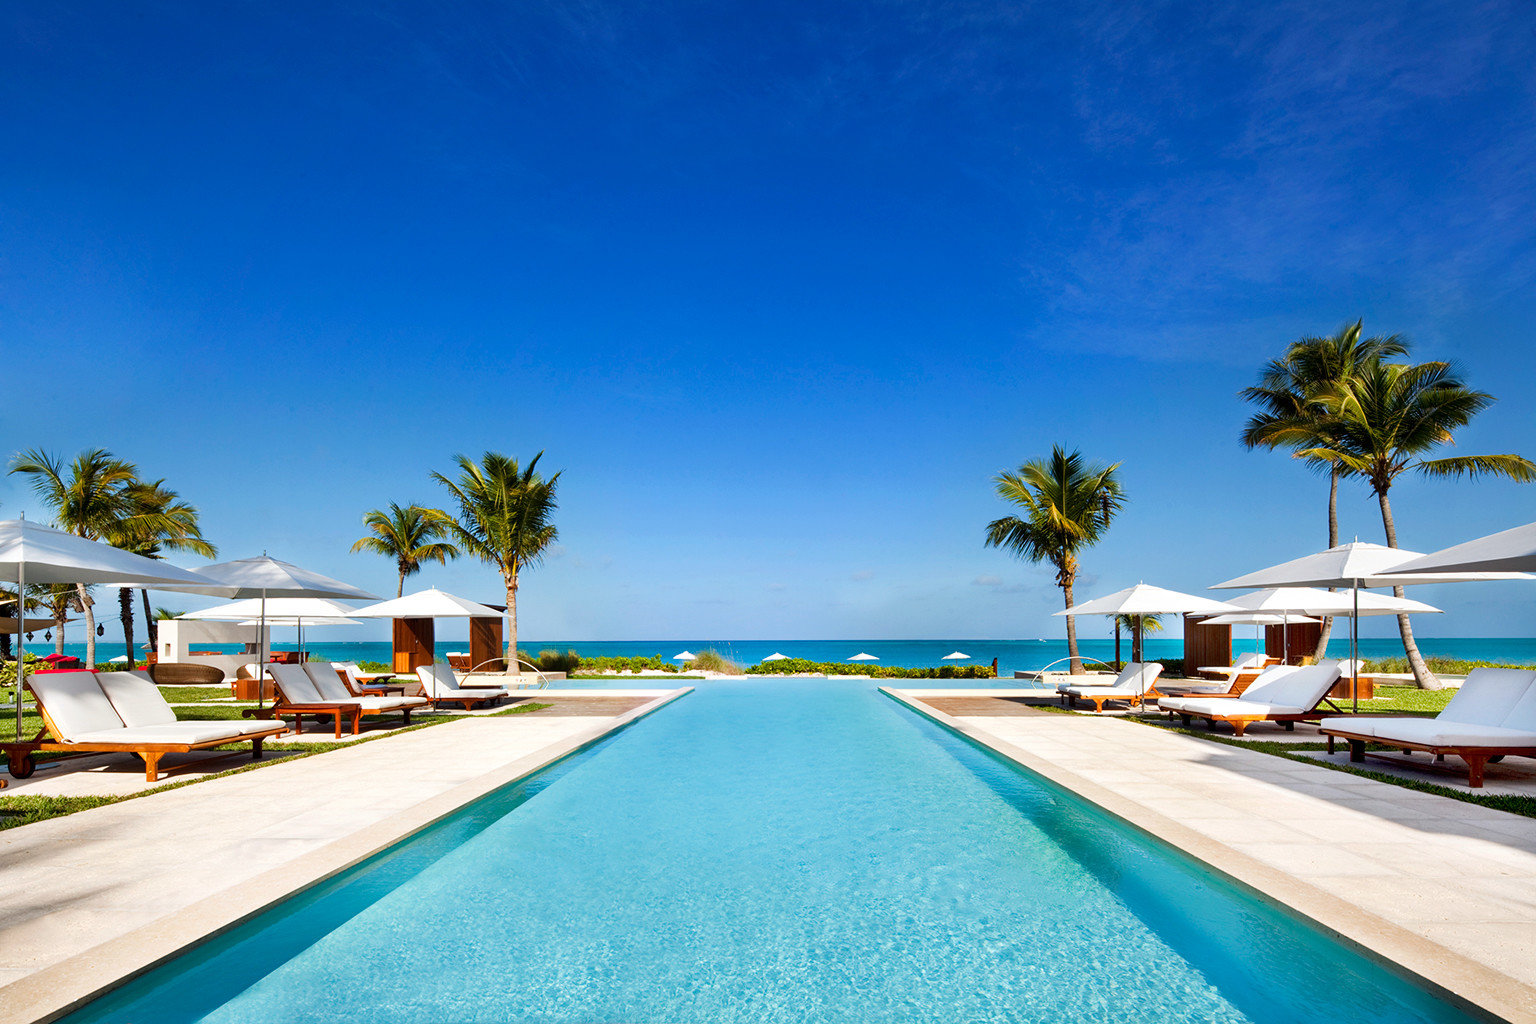 Beachfront Grounds Hotels Luxury Pool sky outdoor leisure swimming pool Beach vacation Resort Sea caribbean Ocean way bay marina estate Coast Lagoon dock colorful lined highway